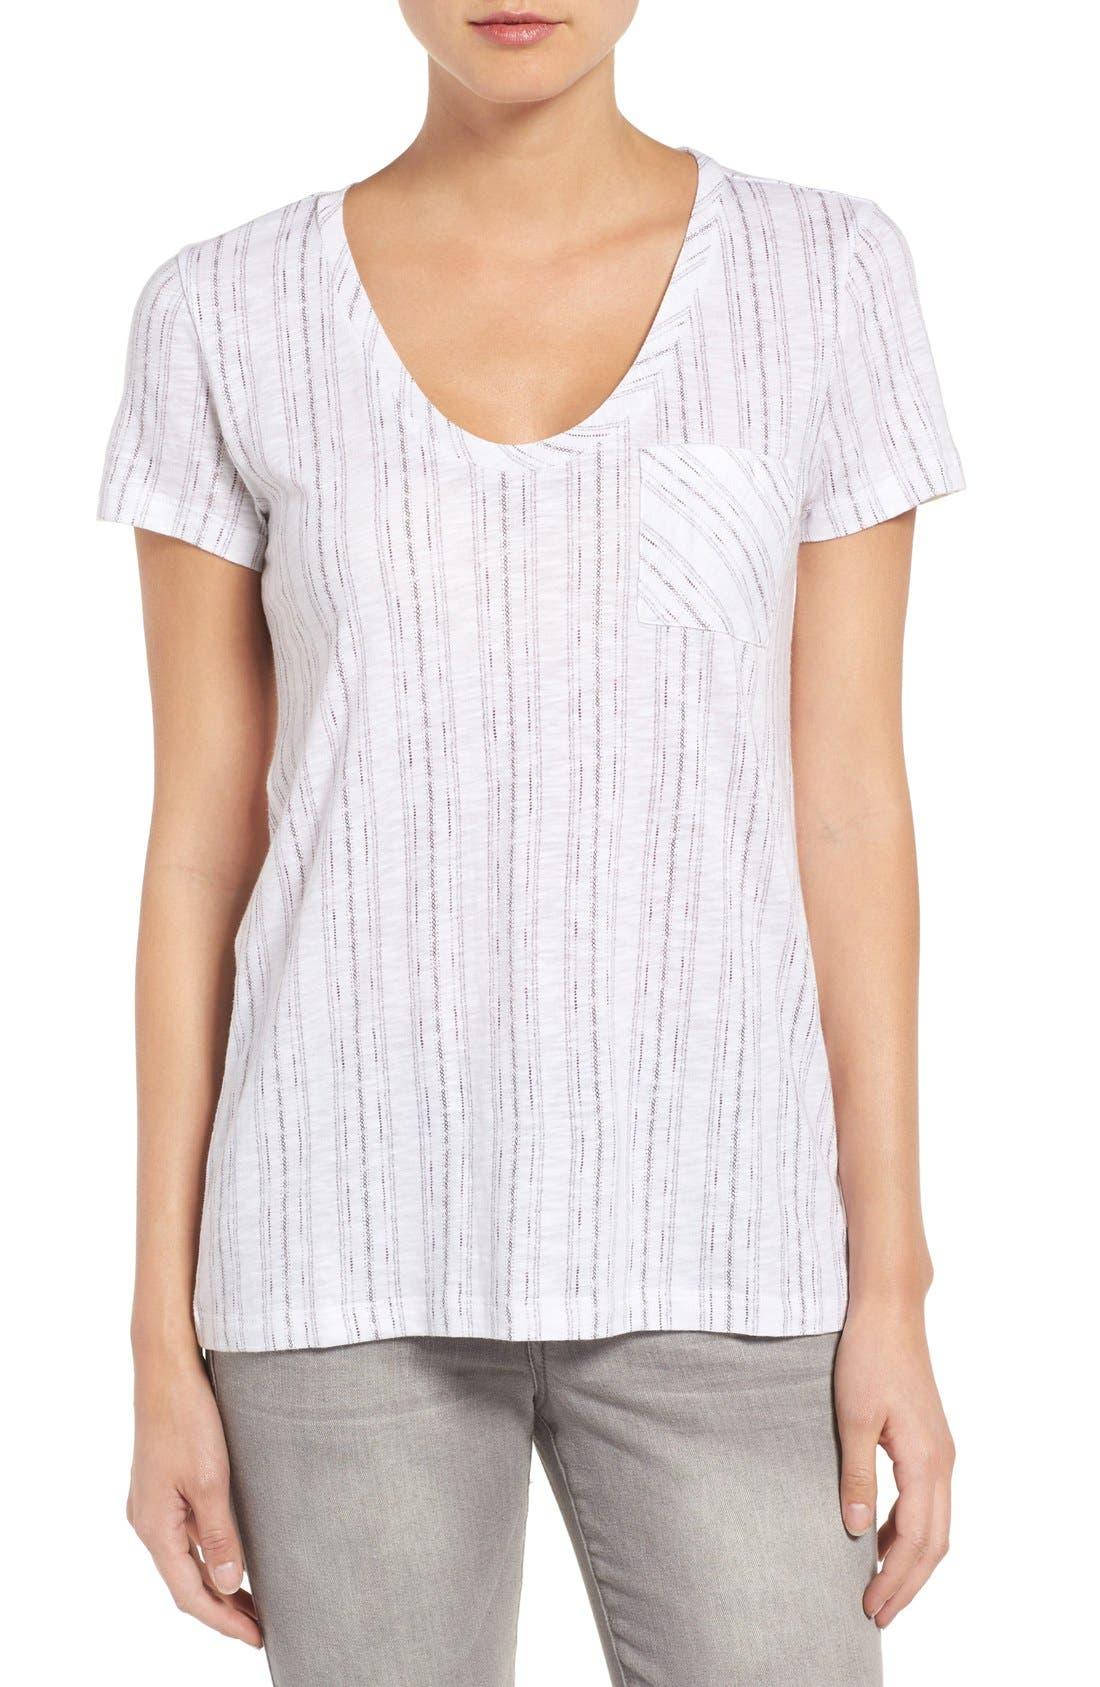 Main Image - Caslon® Relaxed Slub Knit U-Neck Tee (Regular & Petite)